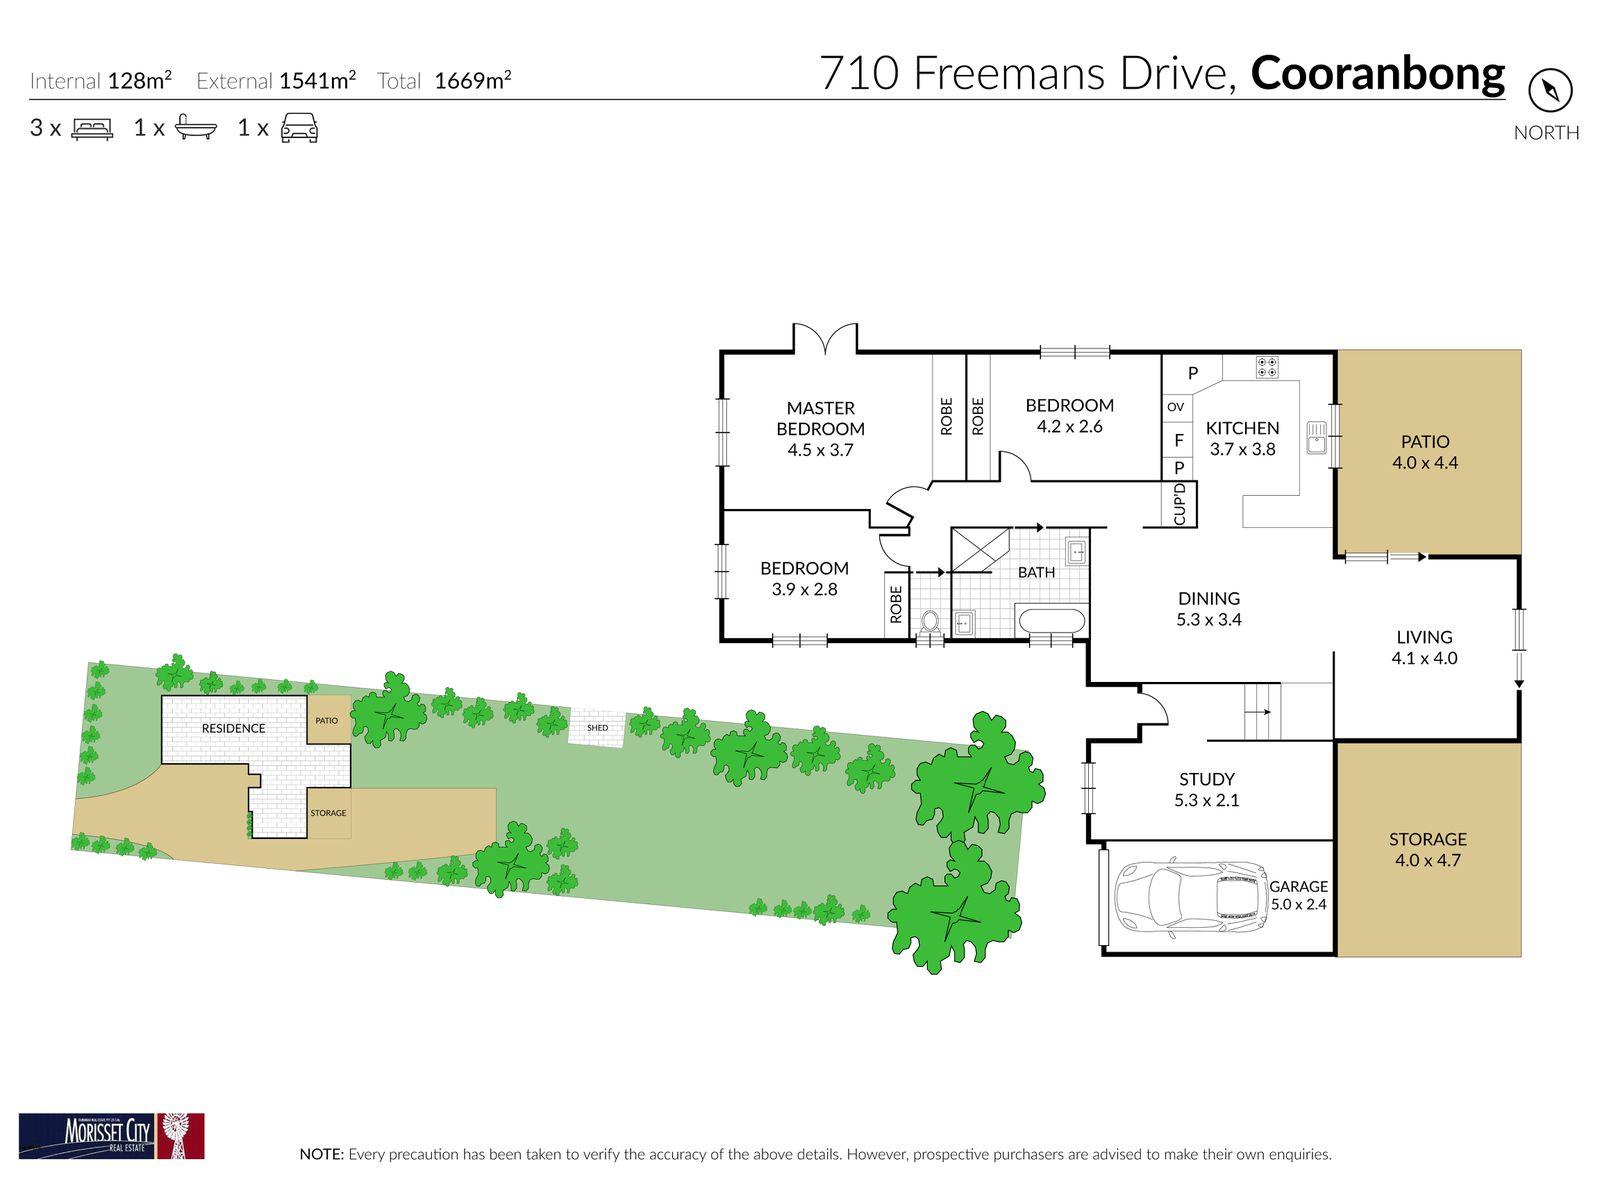 710 Freemans Drive, Cooranbong